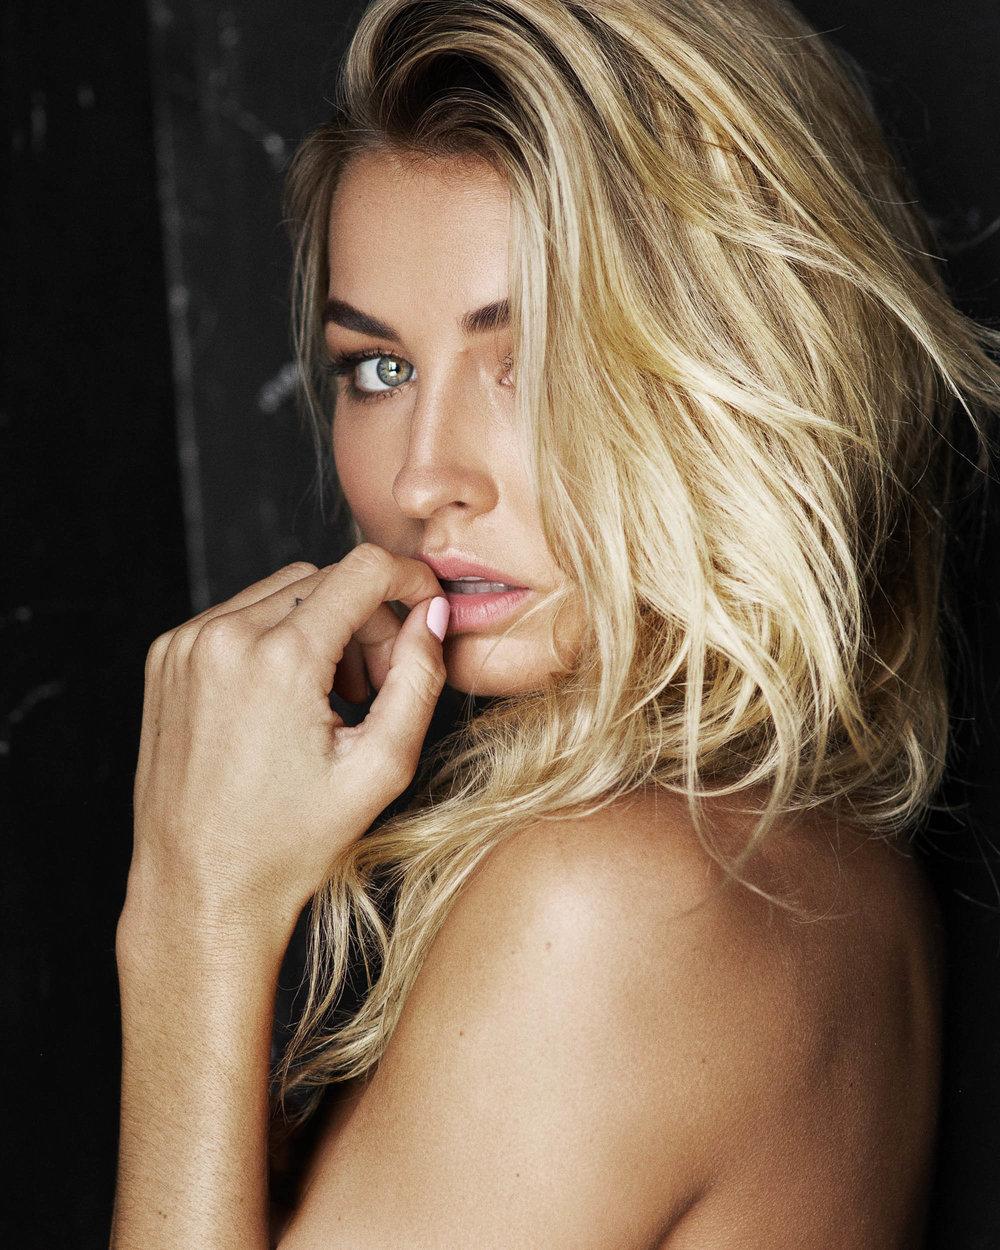 Beauty Portrait of Madi Edwards shot in Sydney by Nick Walters.jpg